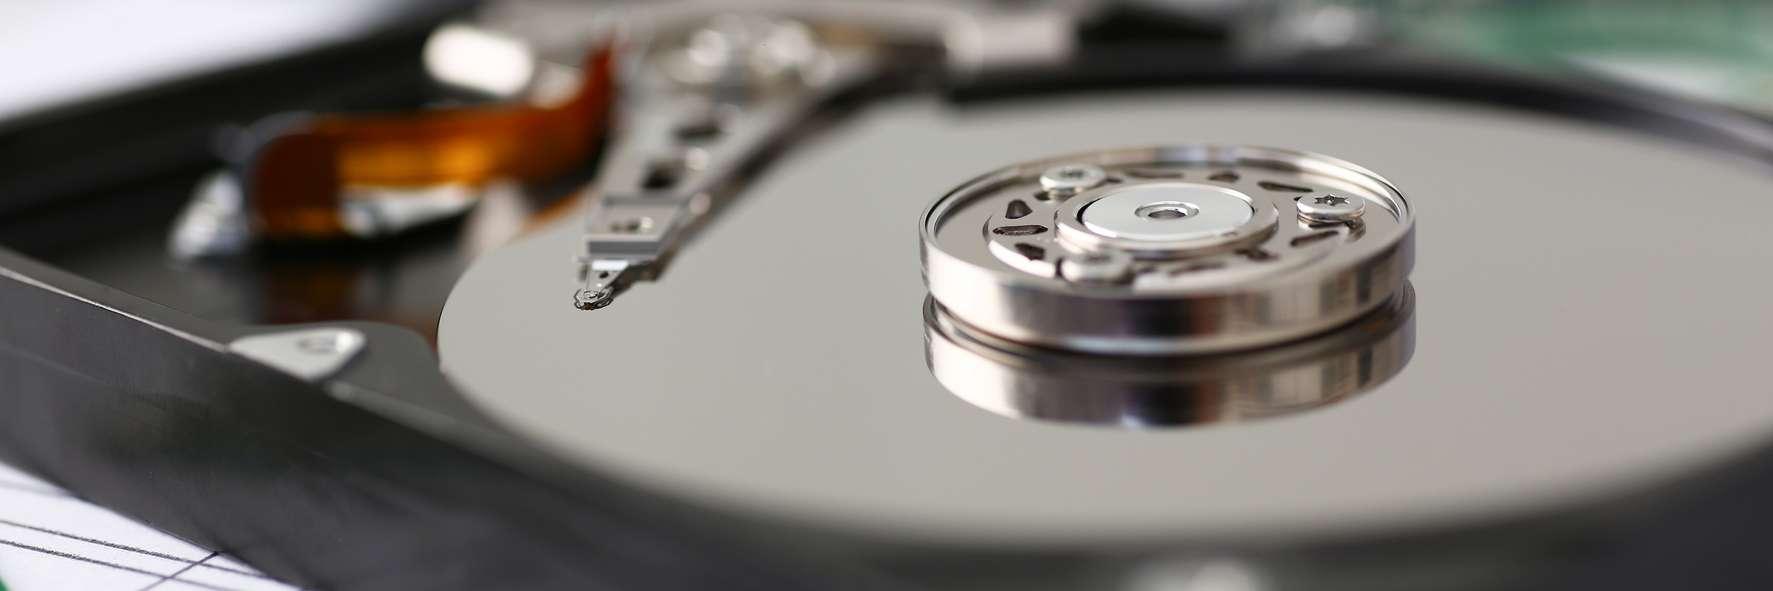 Hard Disk Drive Platter